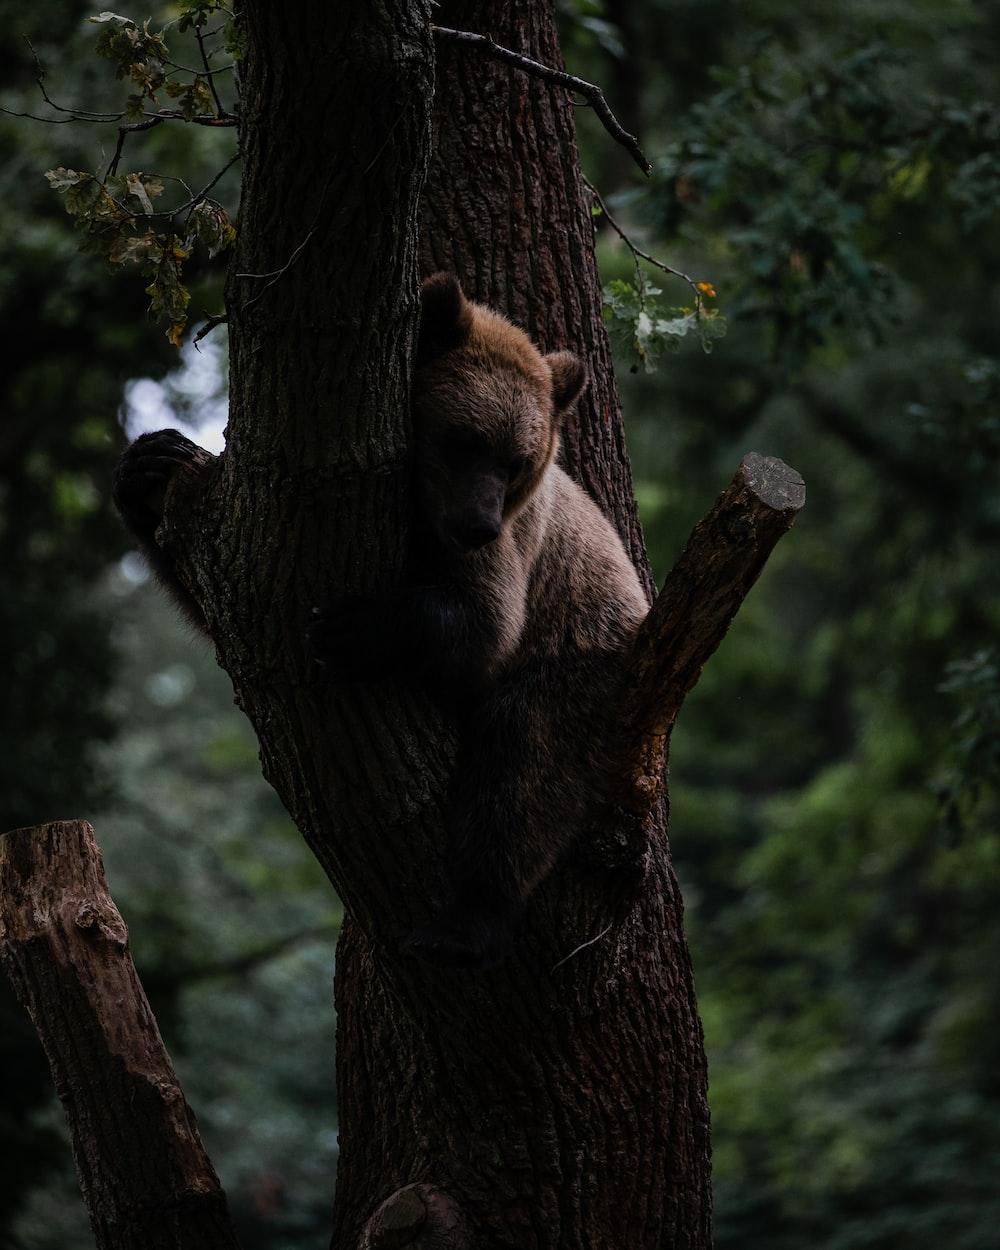 brown bear lying on tree